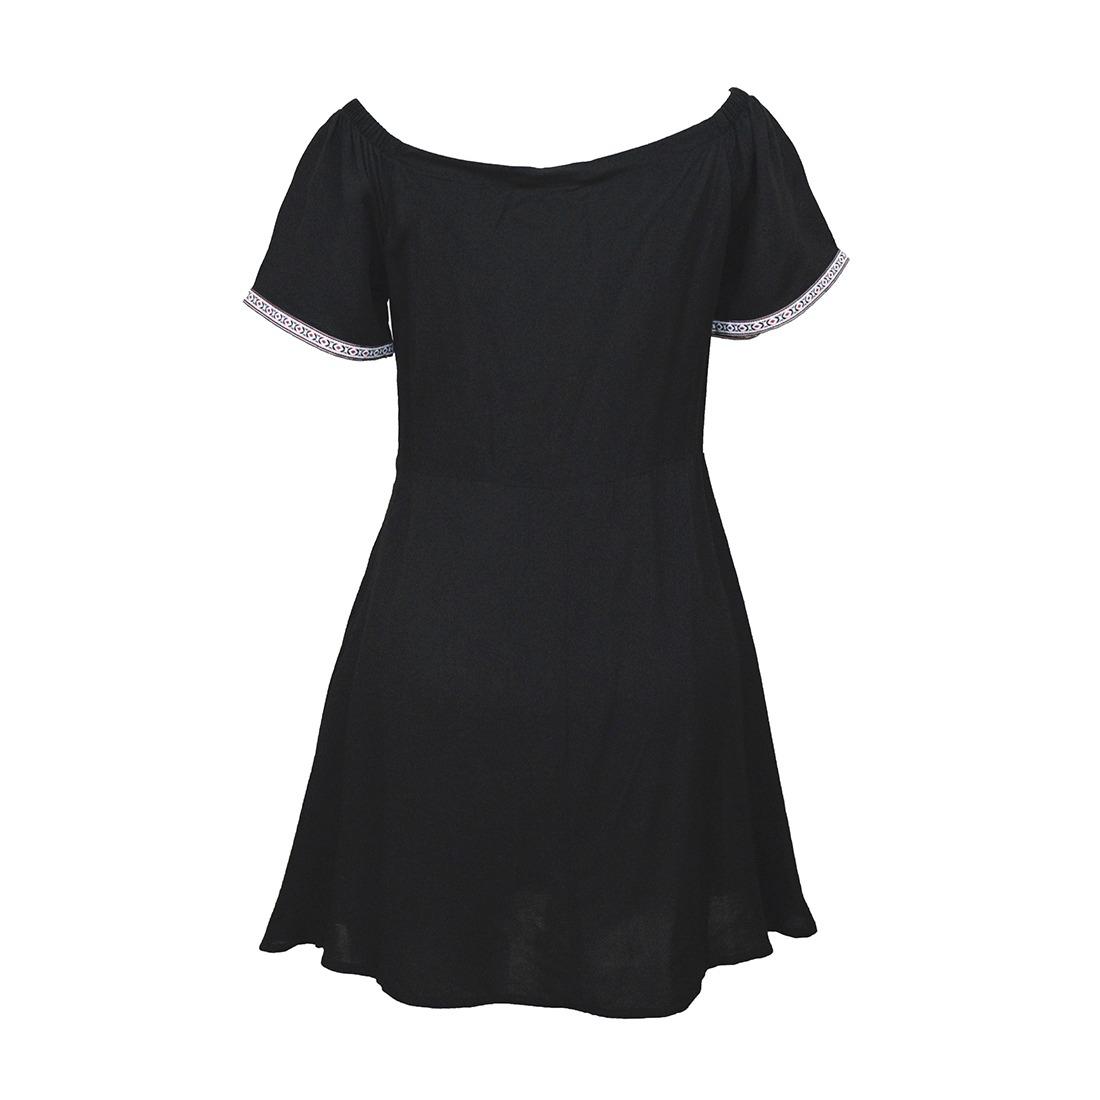 13cd49faa9 vestido manga corta hombros descubiertos 3254 negro zoara. Cargando zoom.